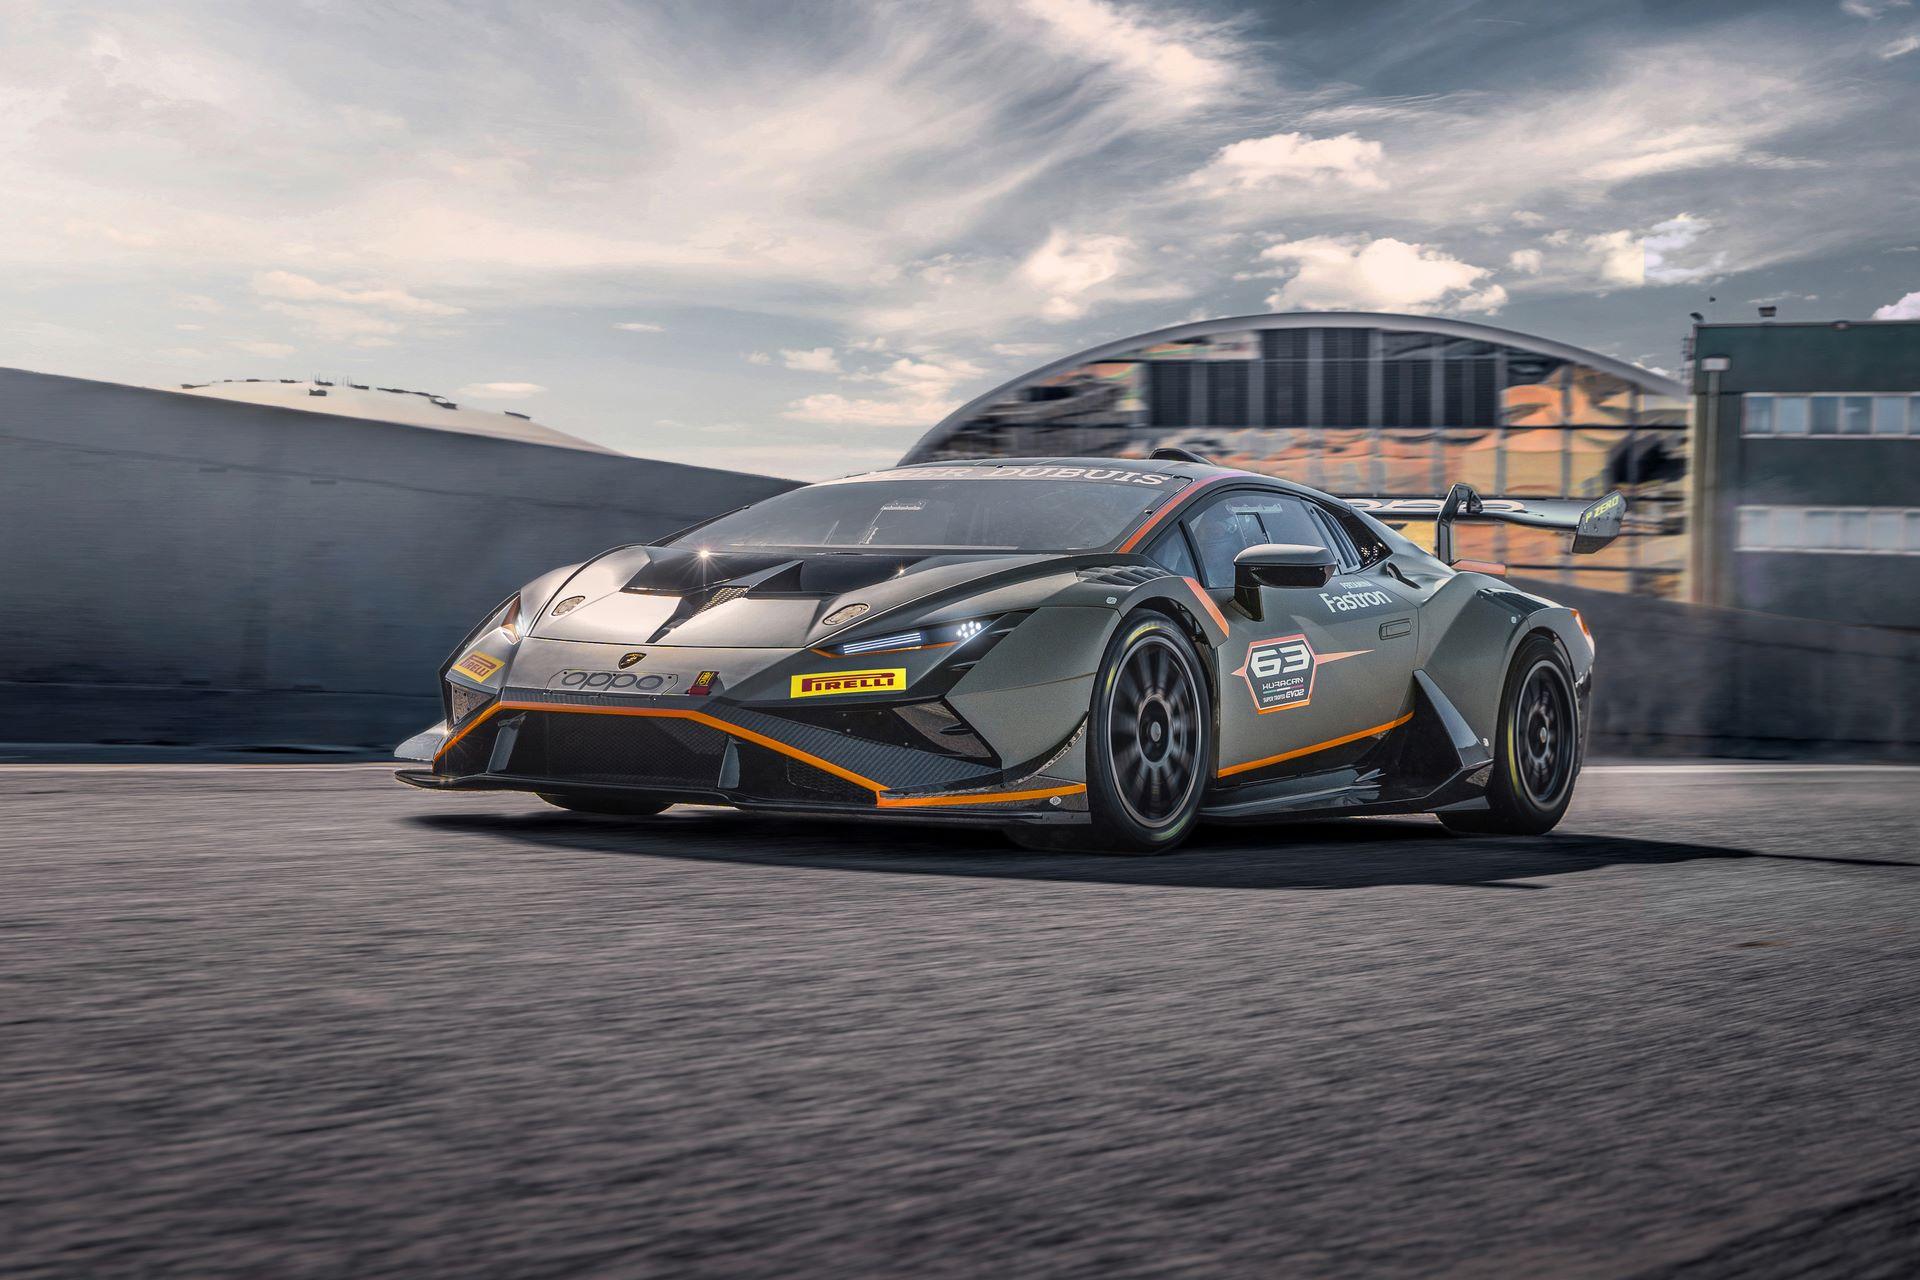 Lamborghini-Huracan-Super-Trofeo-EVO2-1